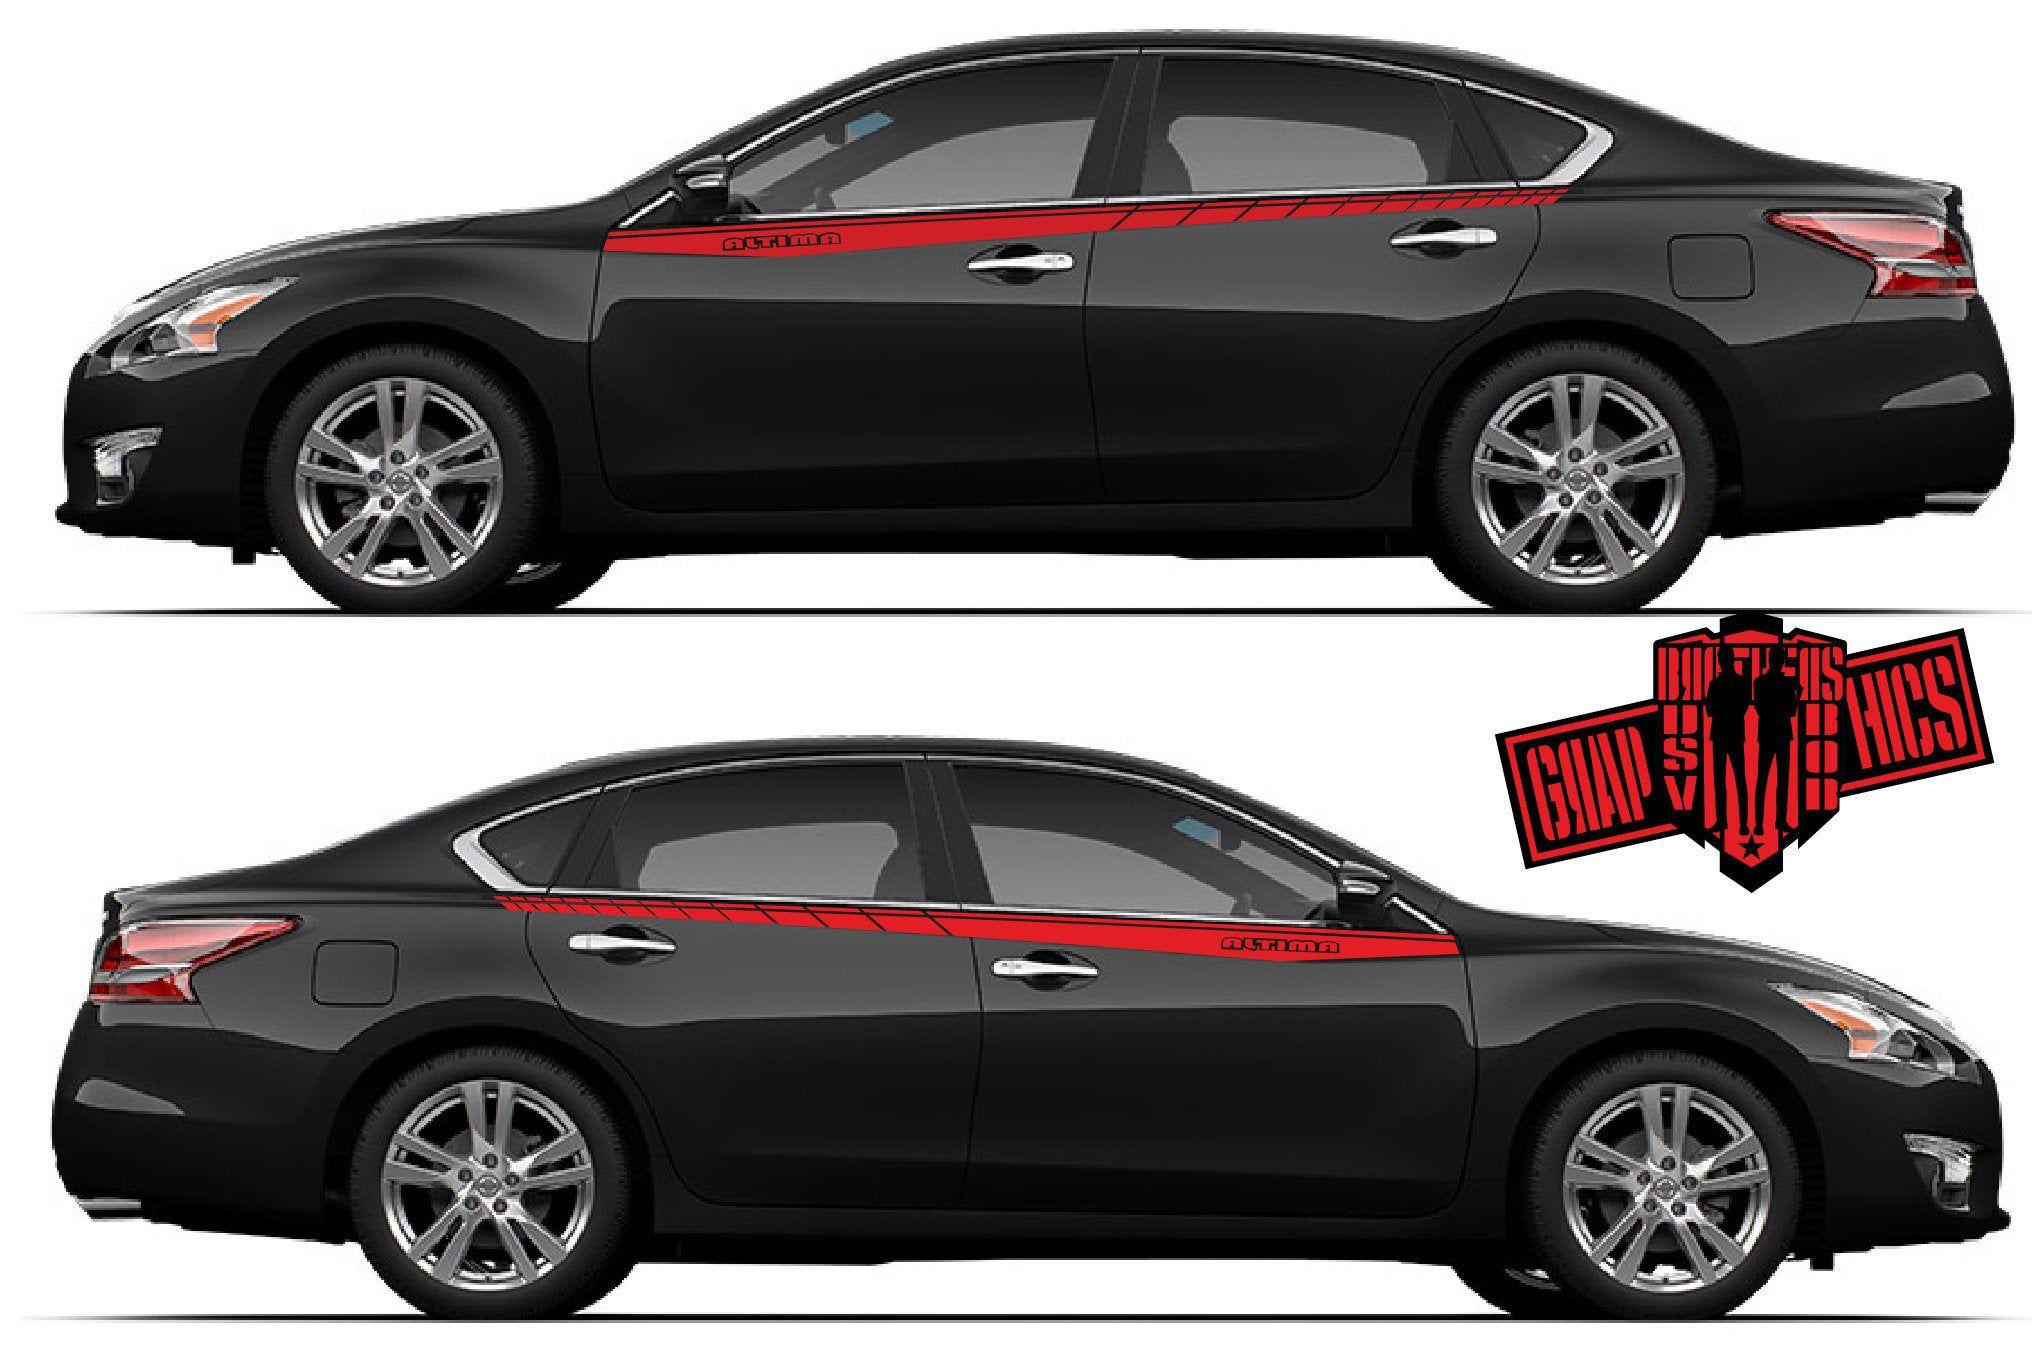 Sport Sticker Decal Side Door Stripes For Nissan Altima Etsy Nissan Altima Altima Nissan